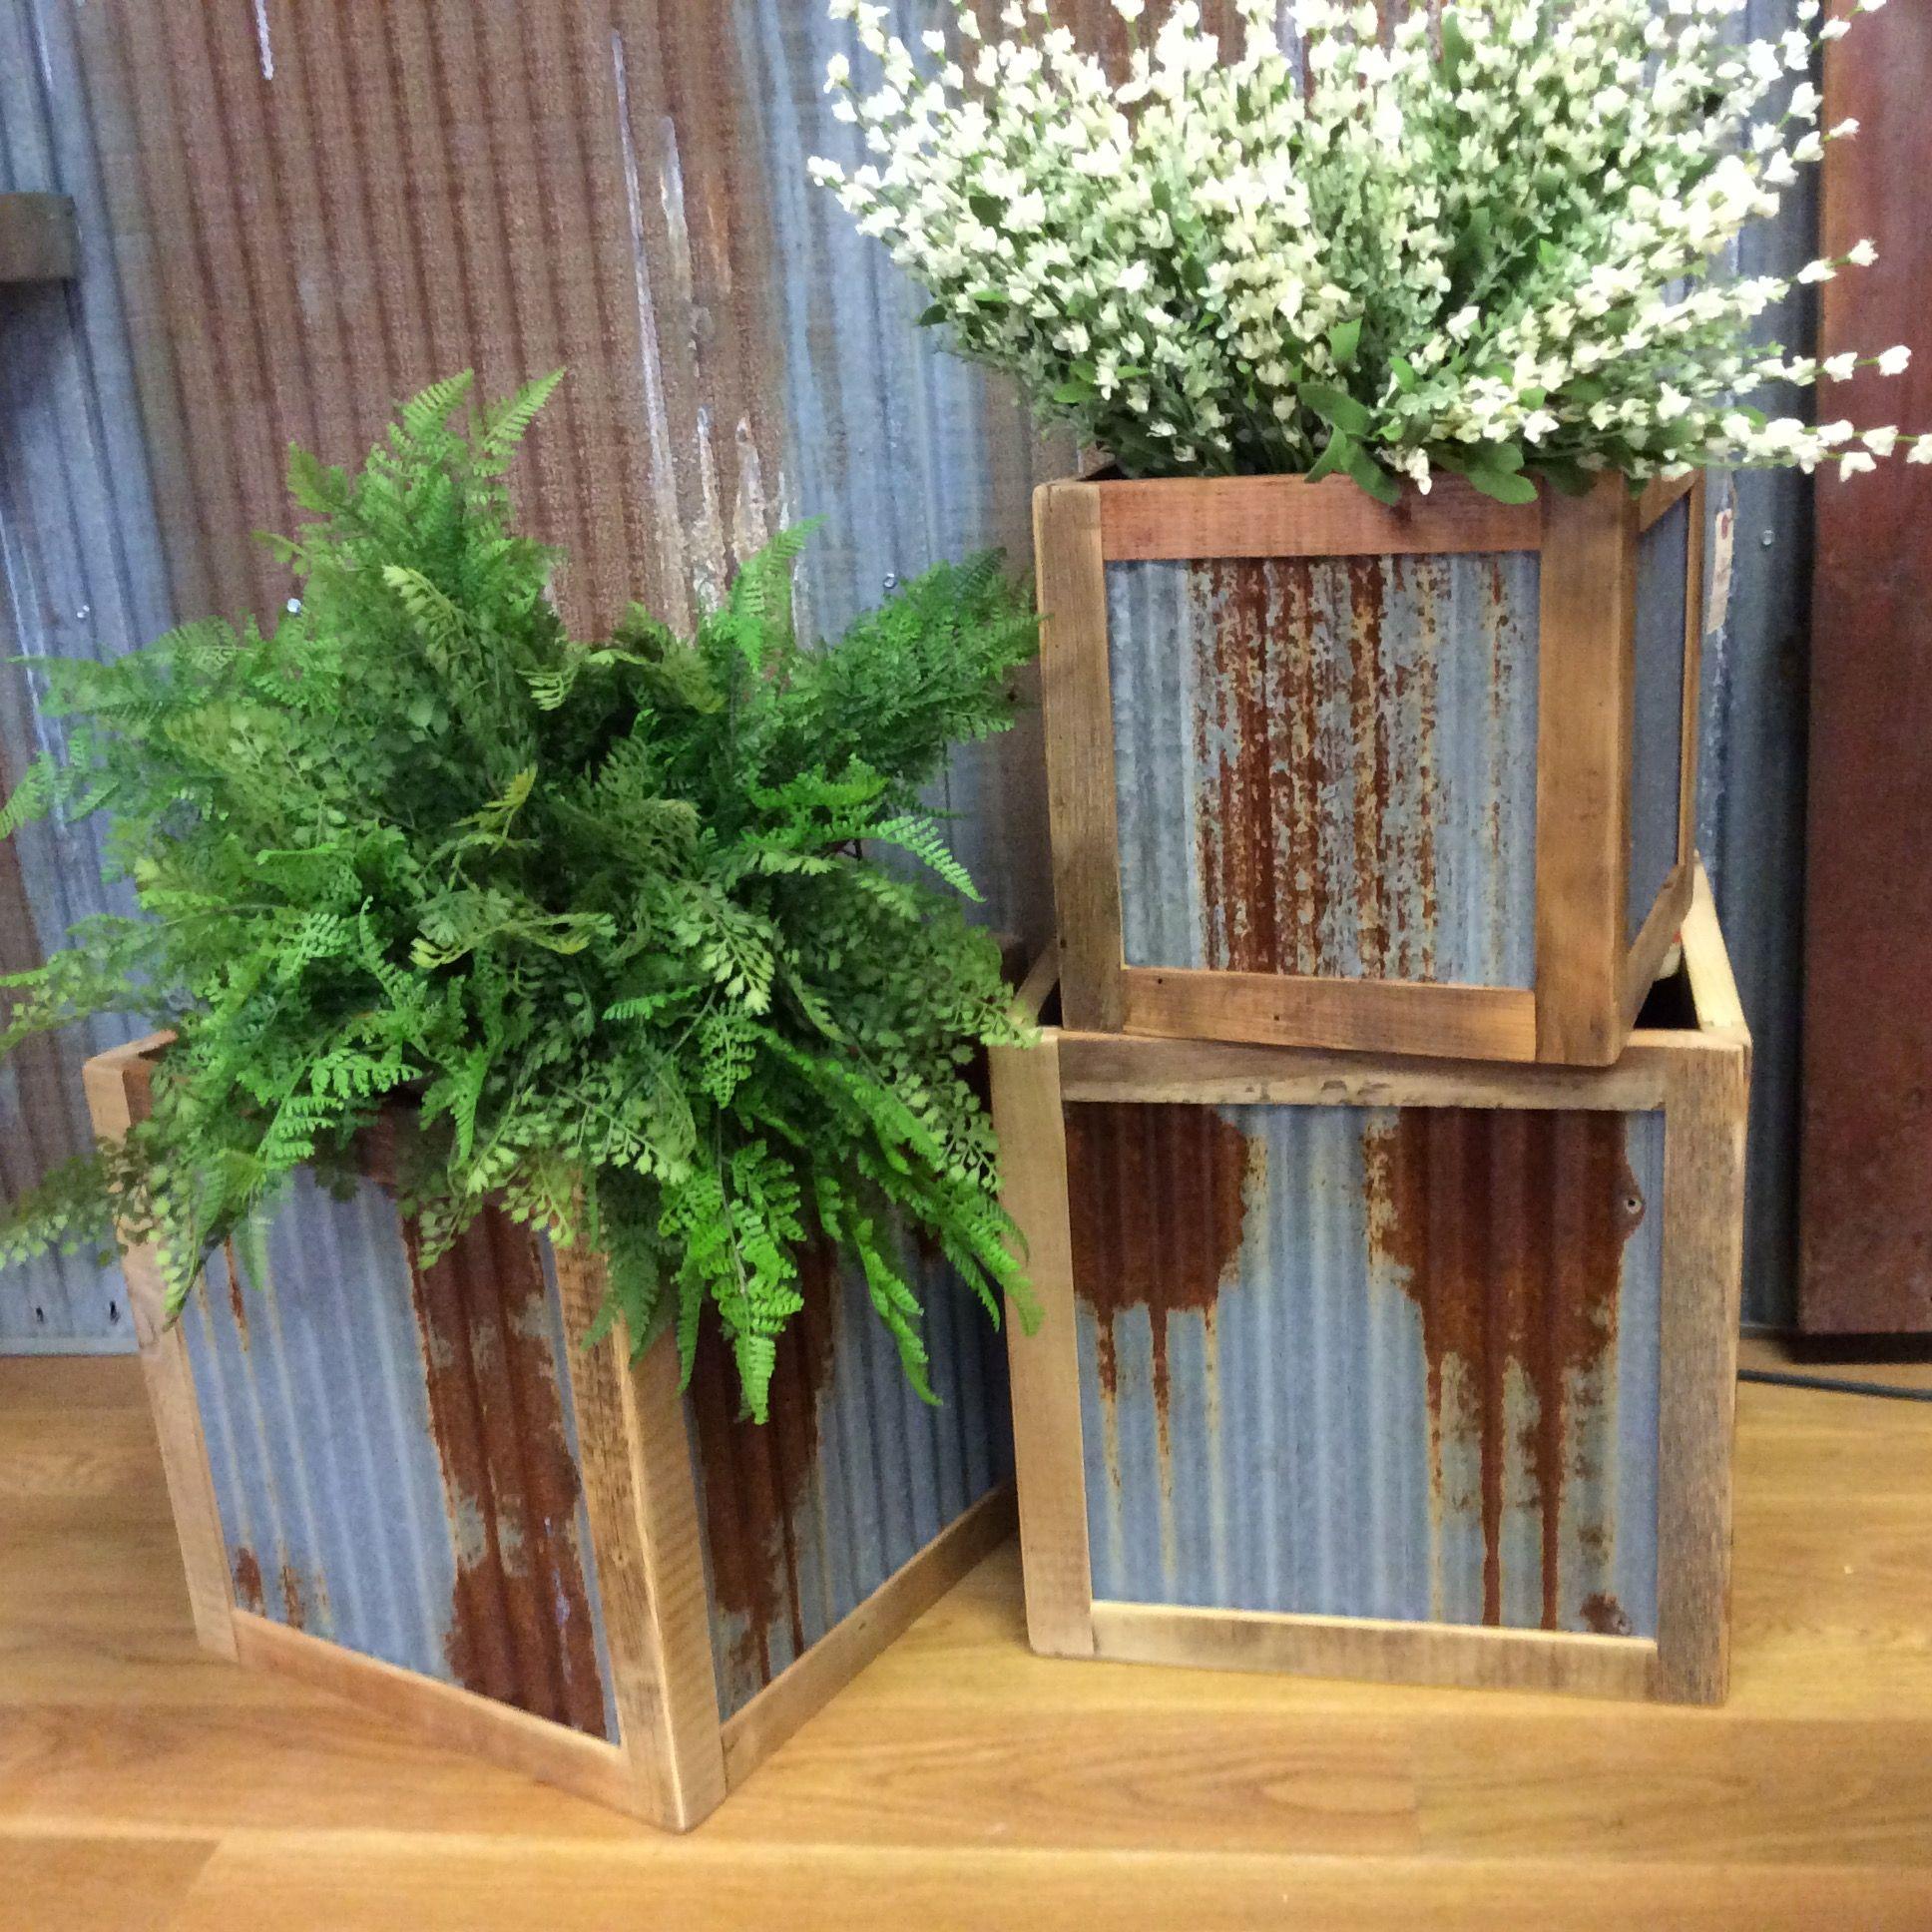 Garden decor kijiji  Easy DIY Planter Box Ideas for Beginners  Country Gardening u Yard